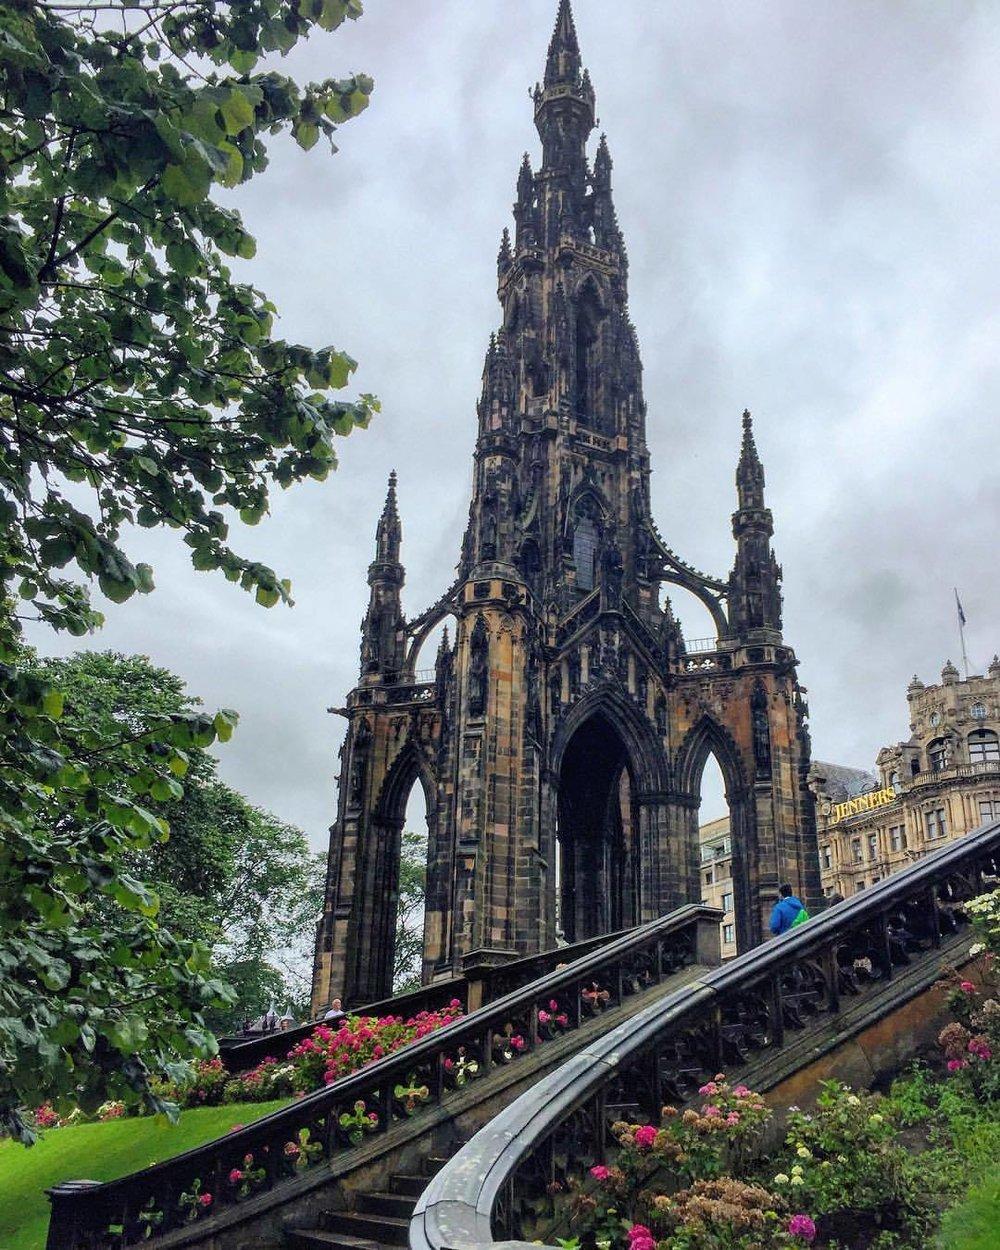 Edinburgh, Scotland.  #walkingholiday #broguesandbeards (at Princes Street Gardens)